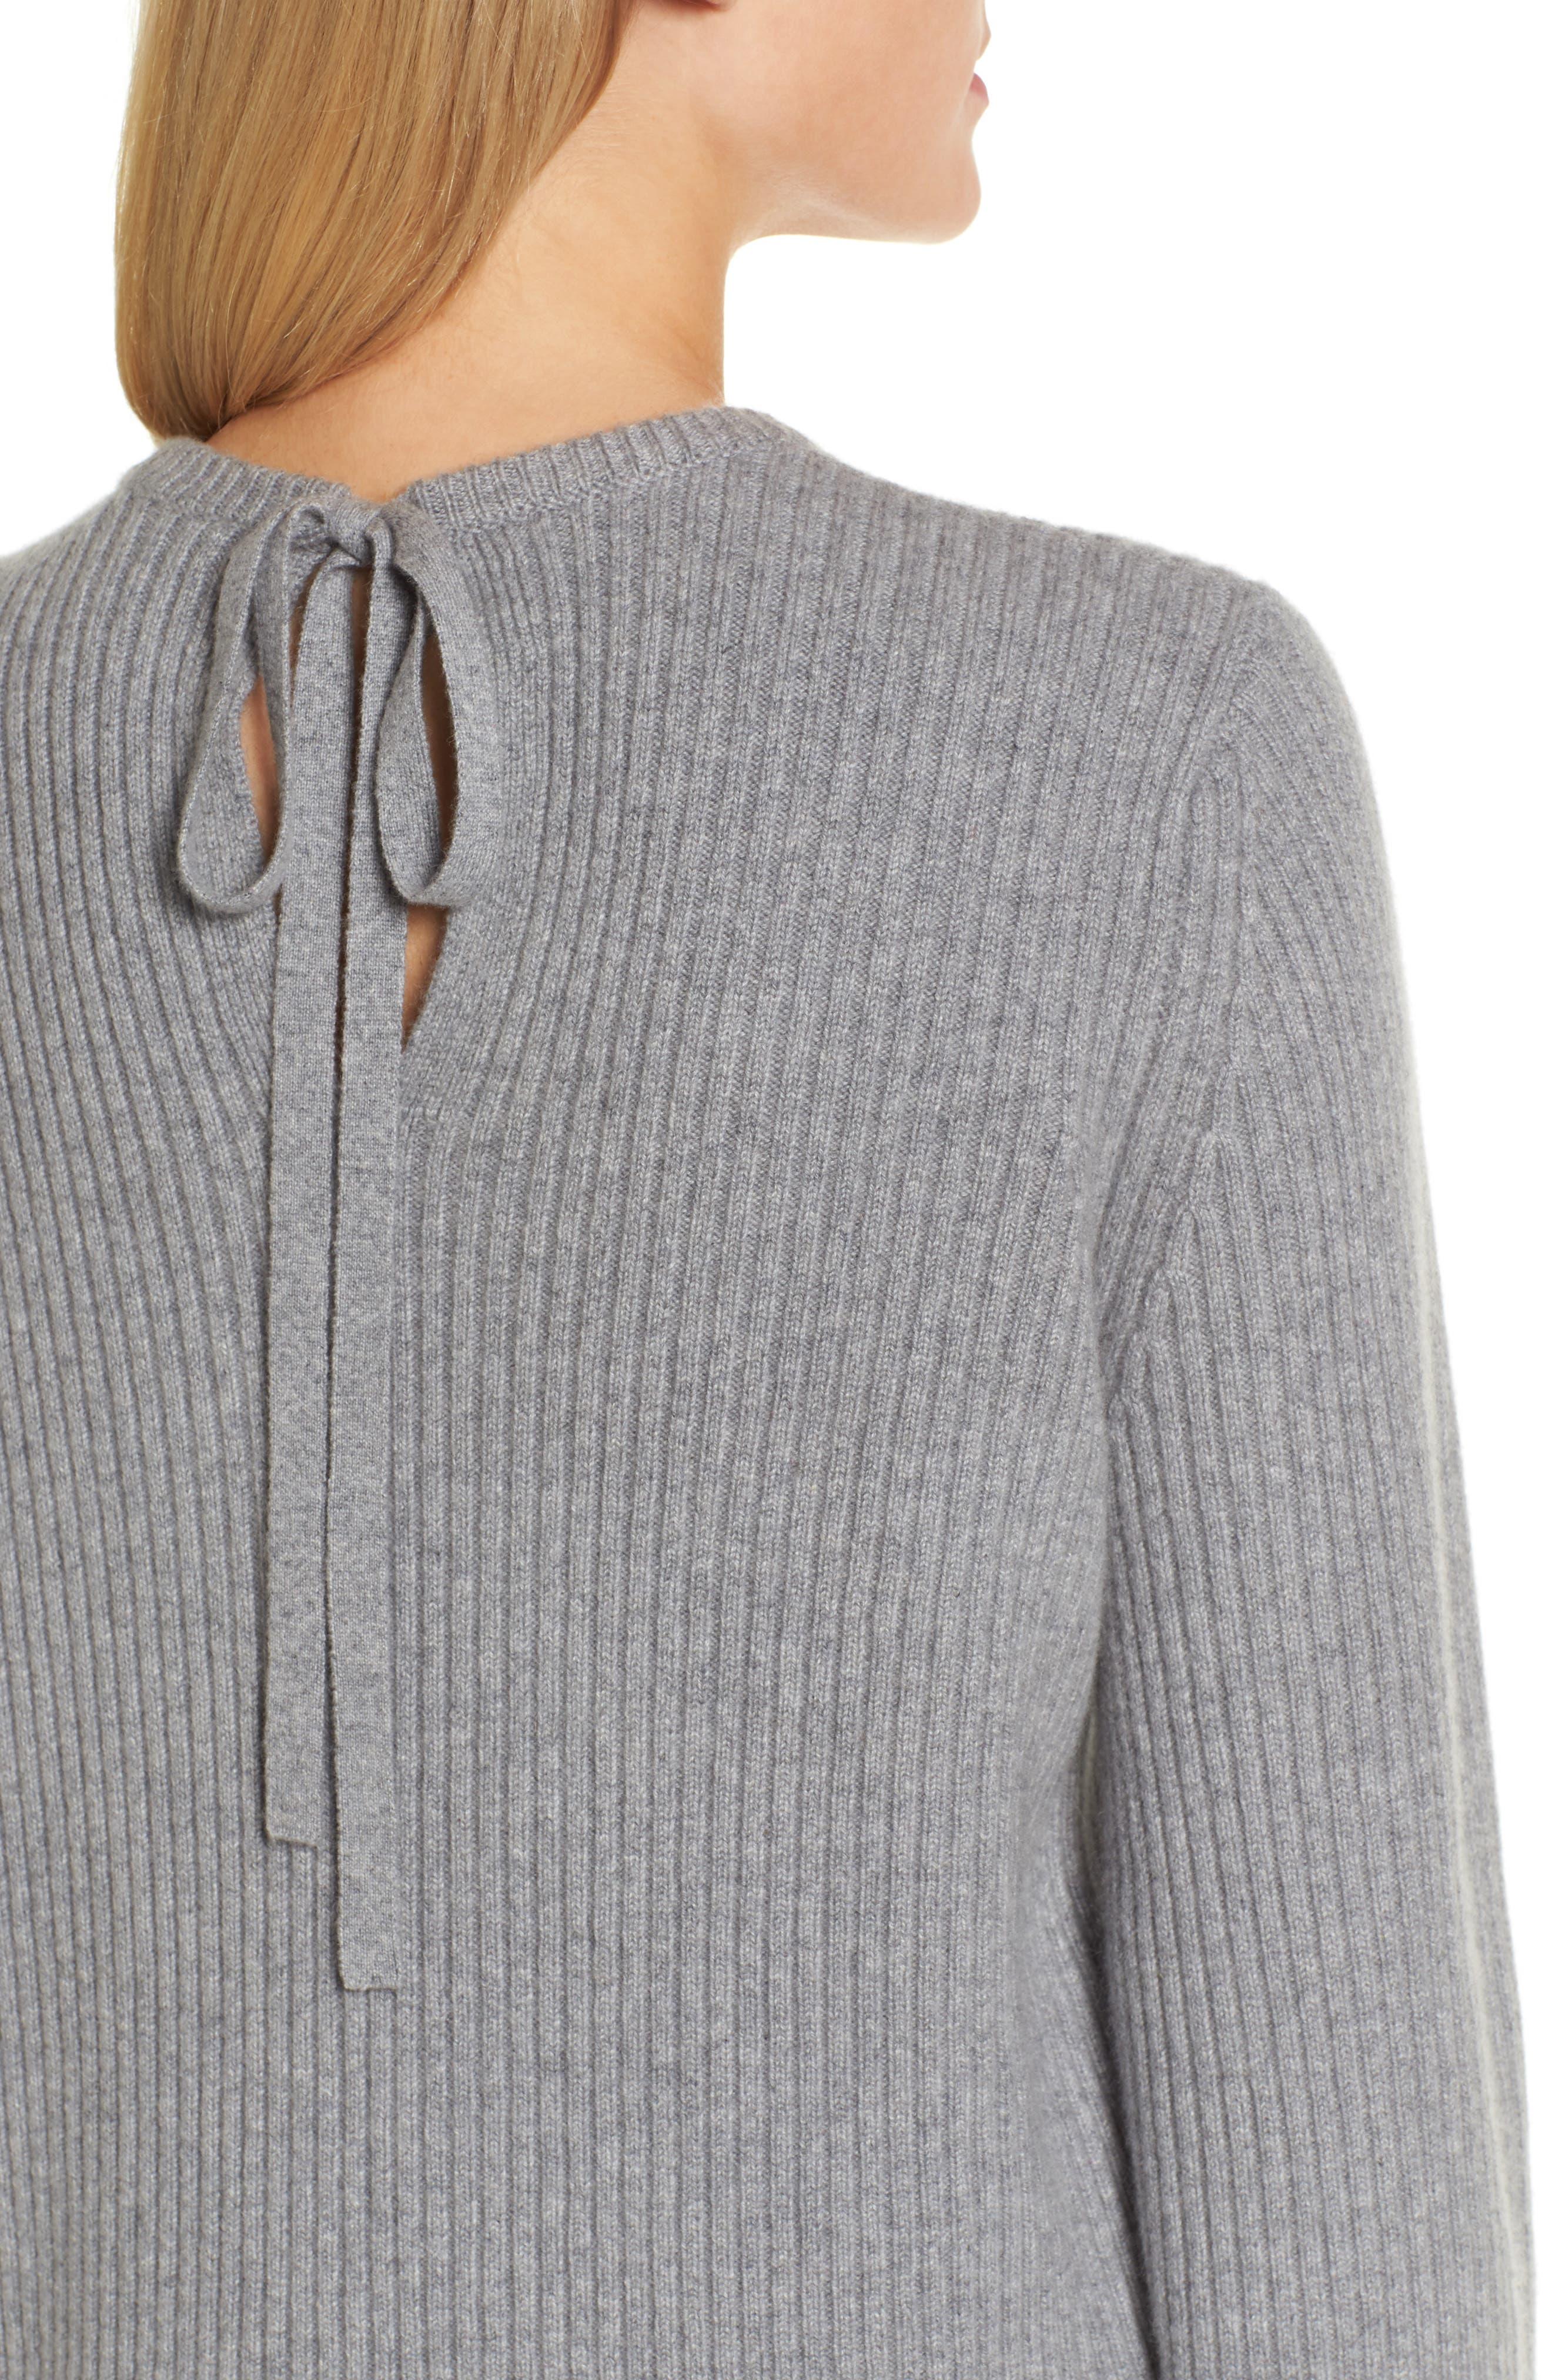 Tie Back Cashmere Blend Sweater,                             Alternate thumbnail 4, color,                             Grey Filigree Heather